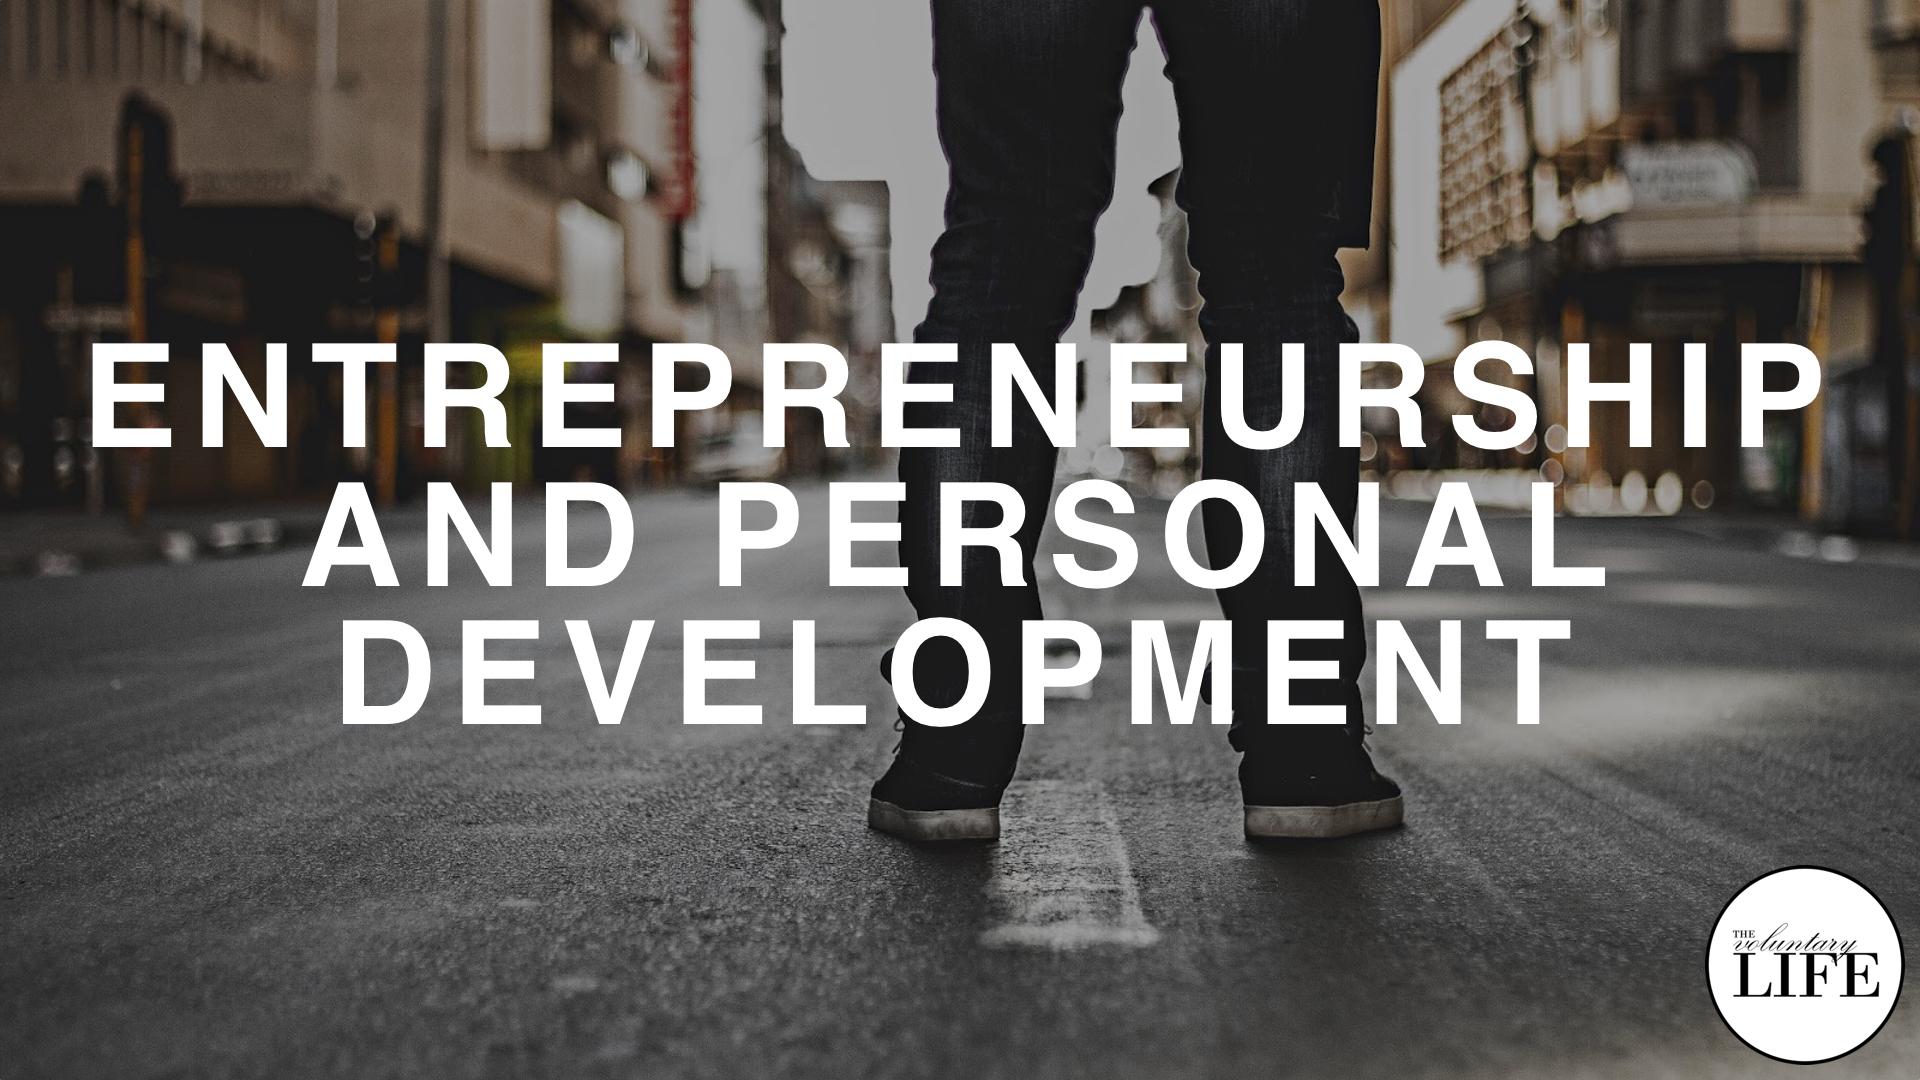 251 Entrepreneurship And Personal Development